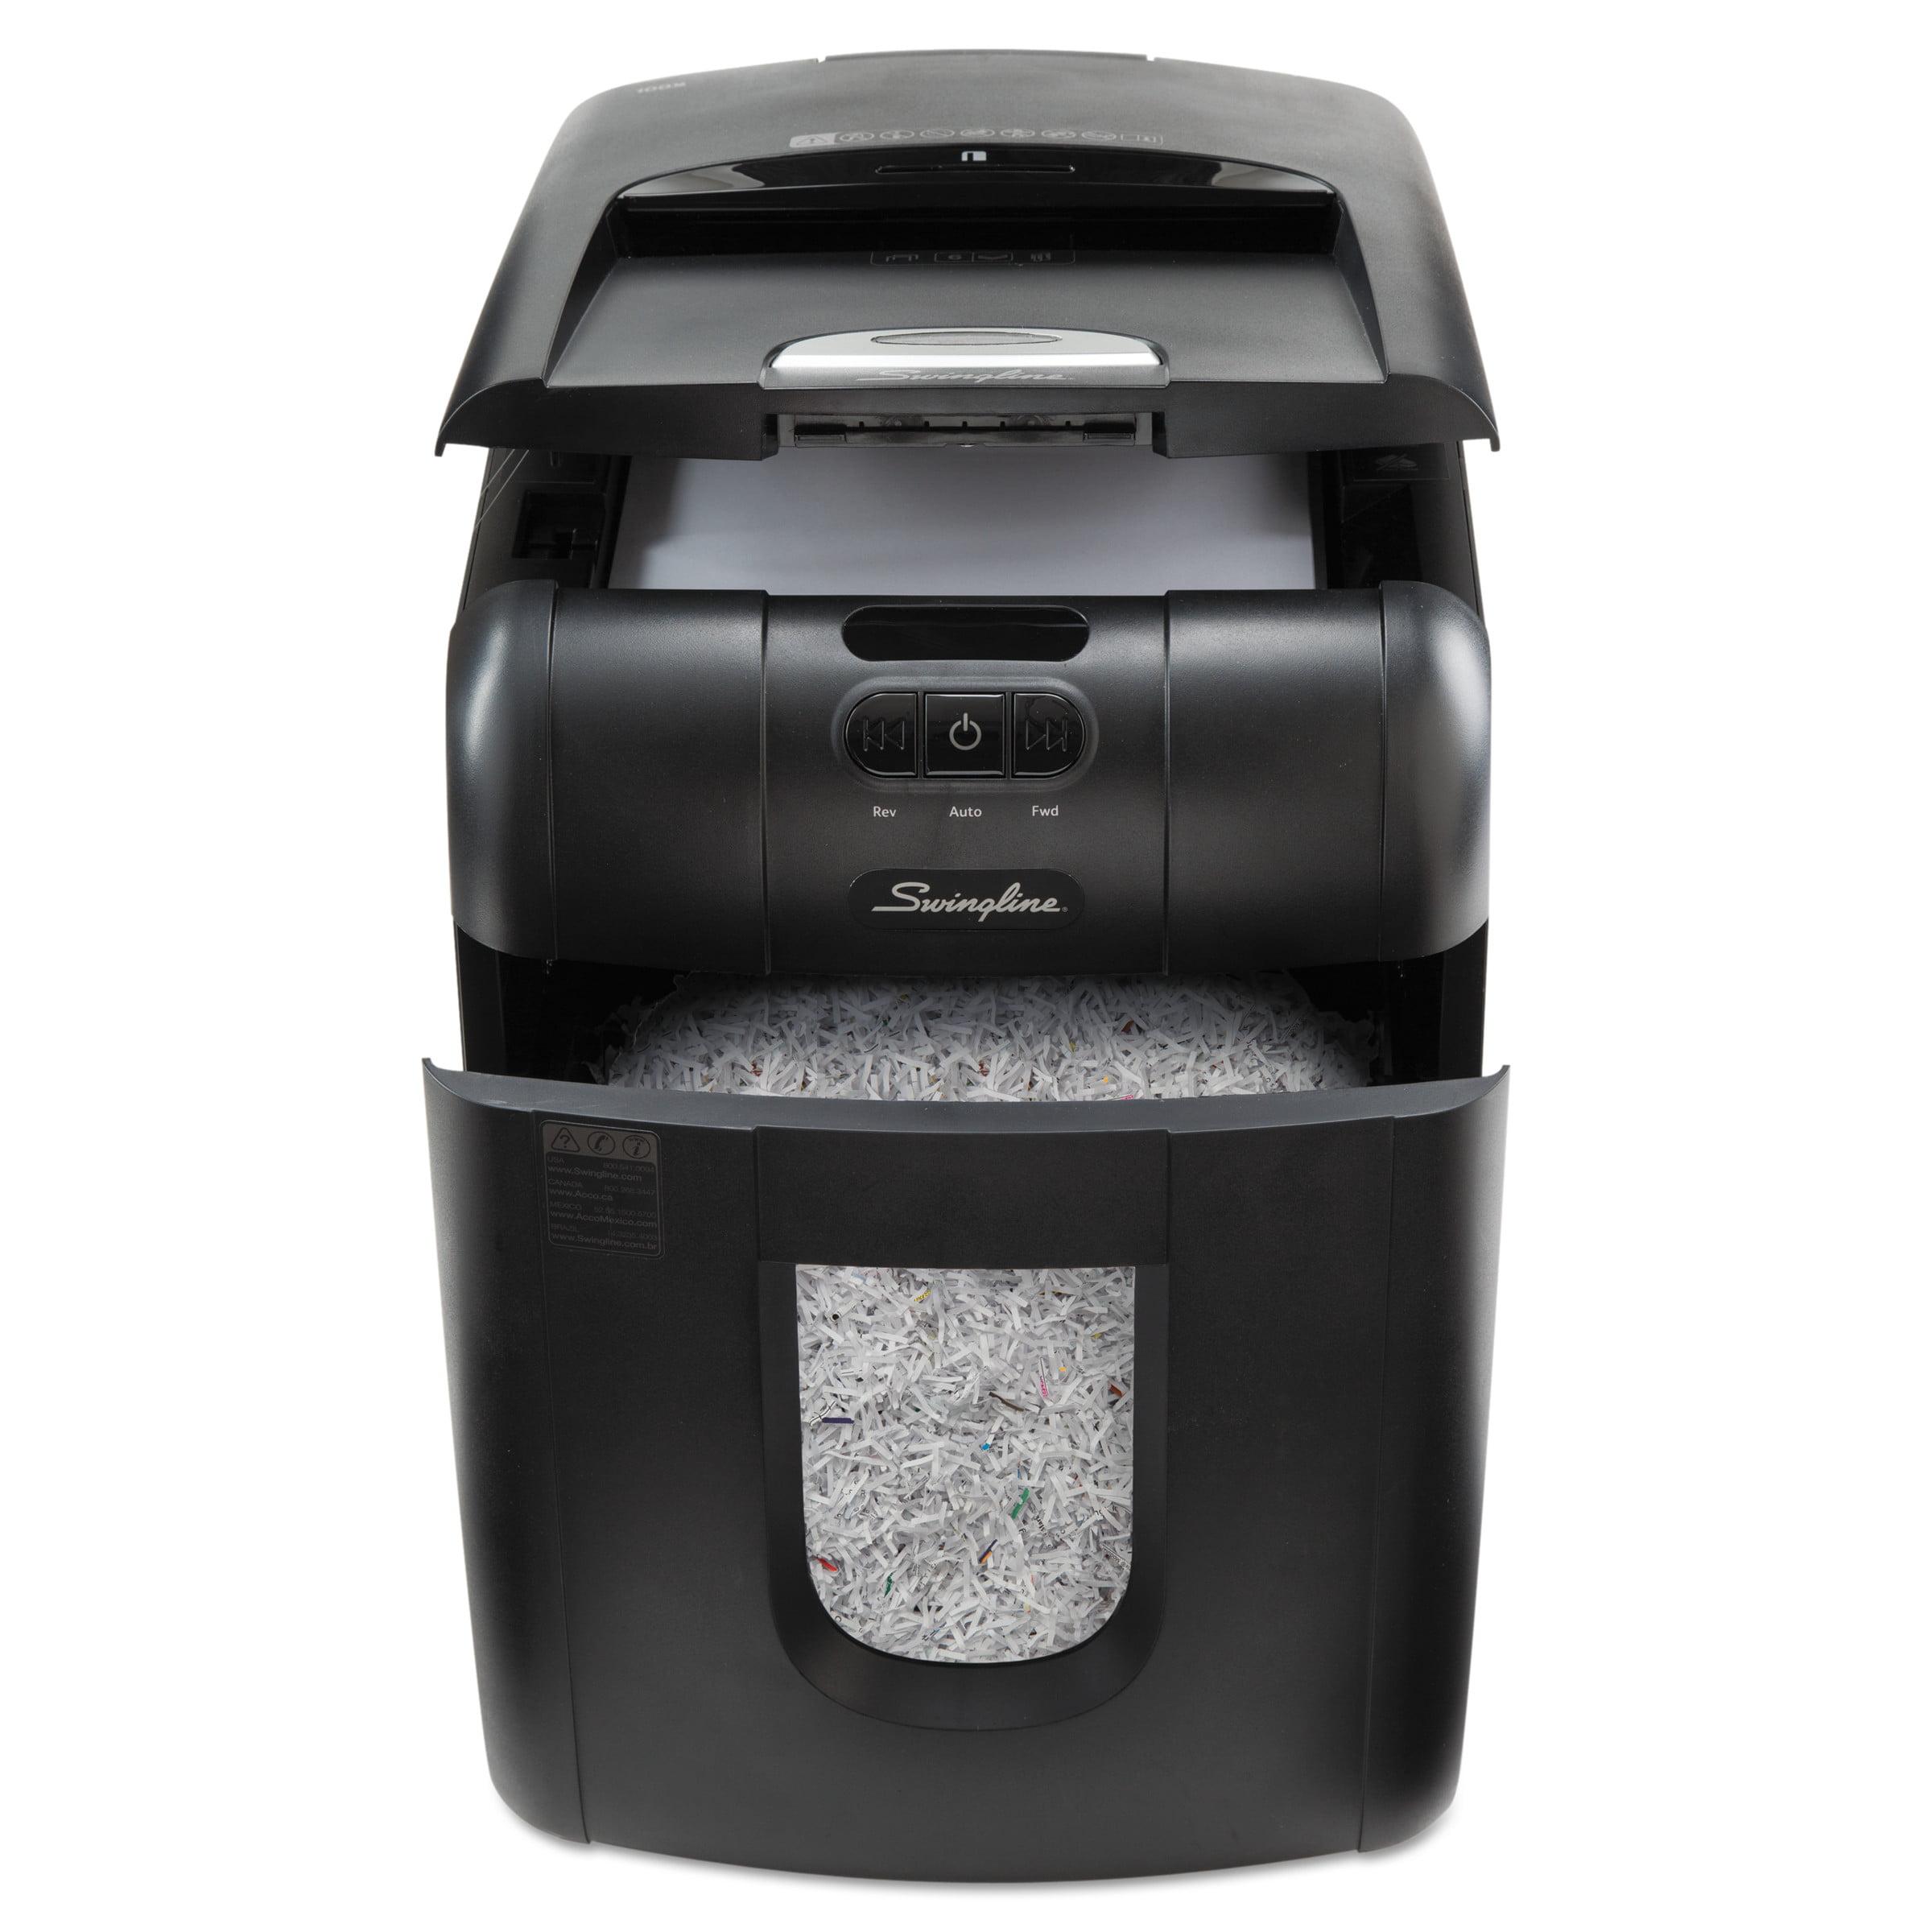 Swingline Stack-and-Shred 130M Auto Feed Micro-Cut Shredder, 130 Sheet Capacity -SWI1758571